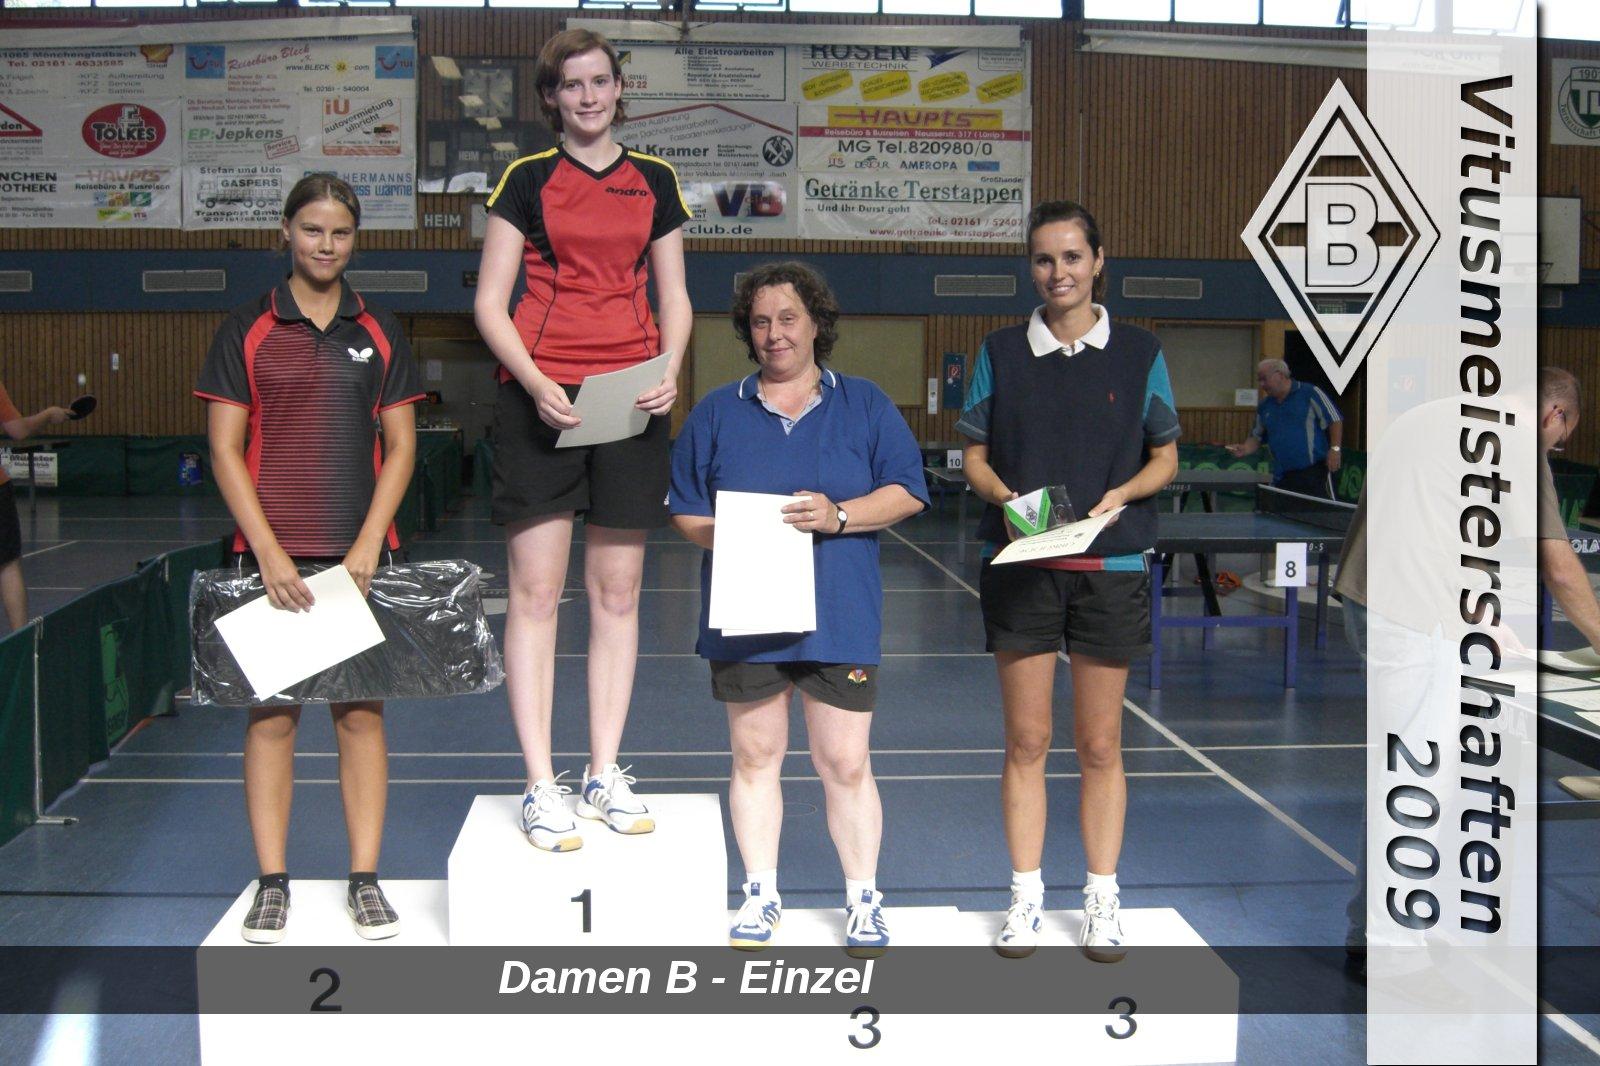 VM2009-DamenB-Einzel